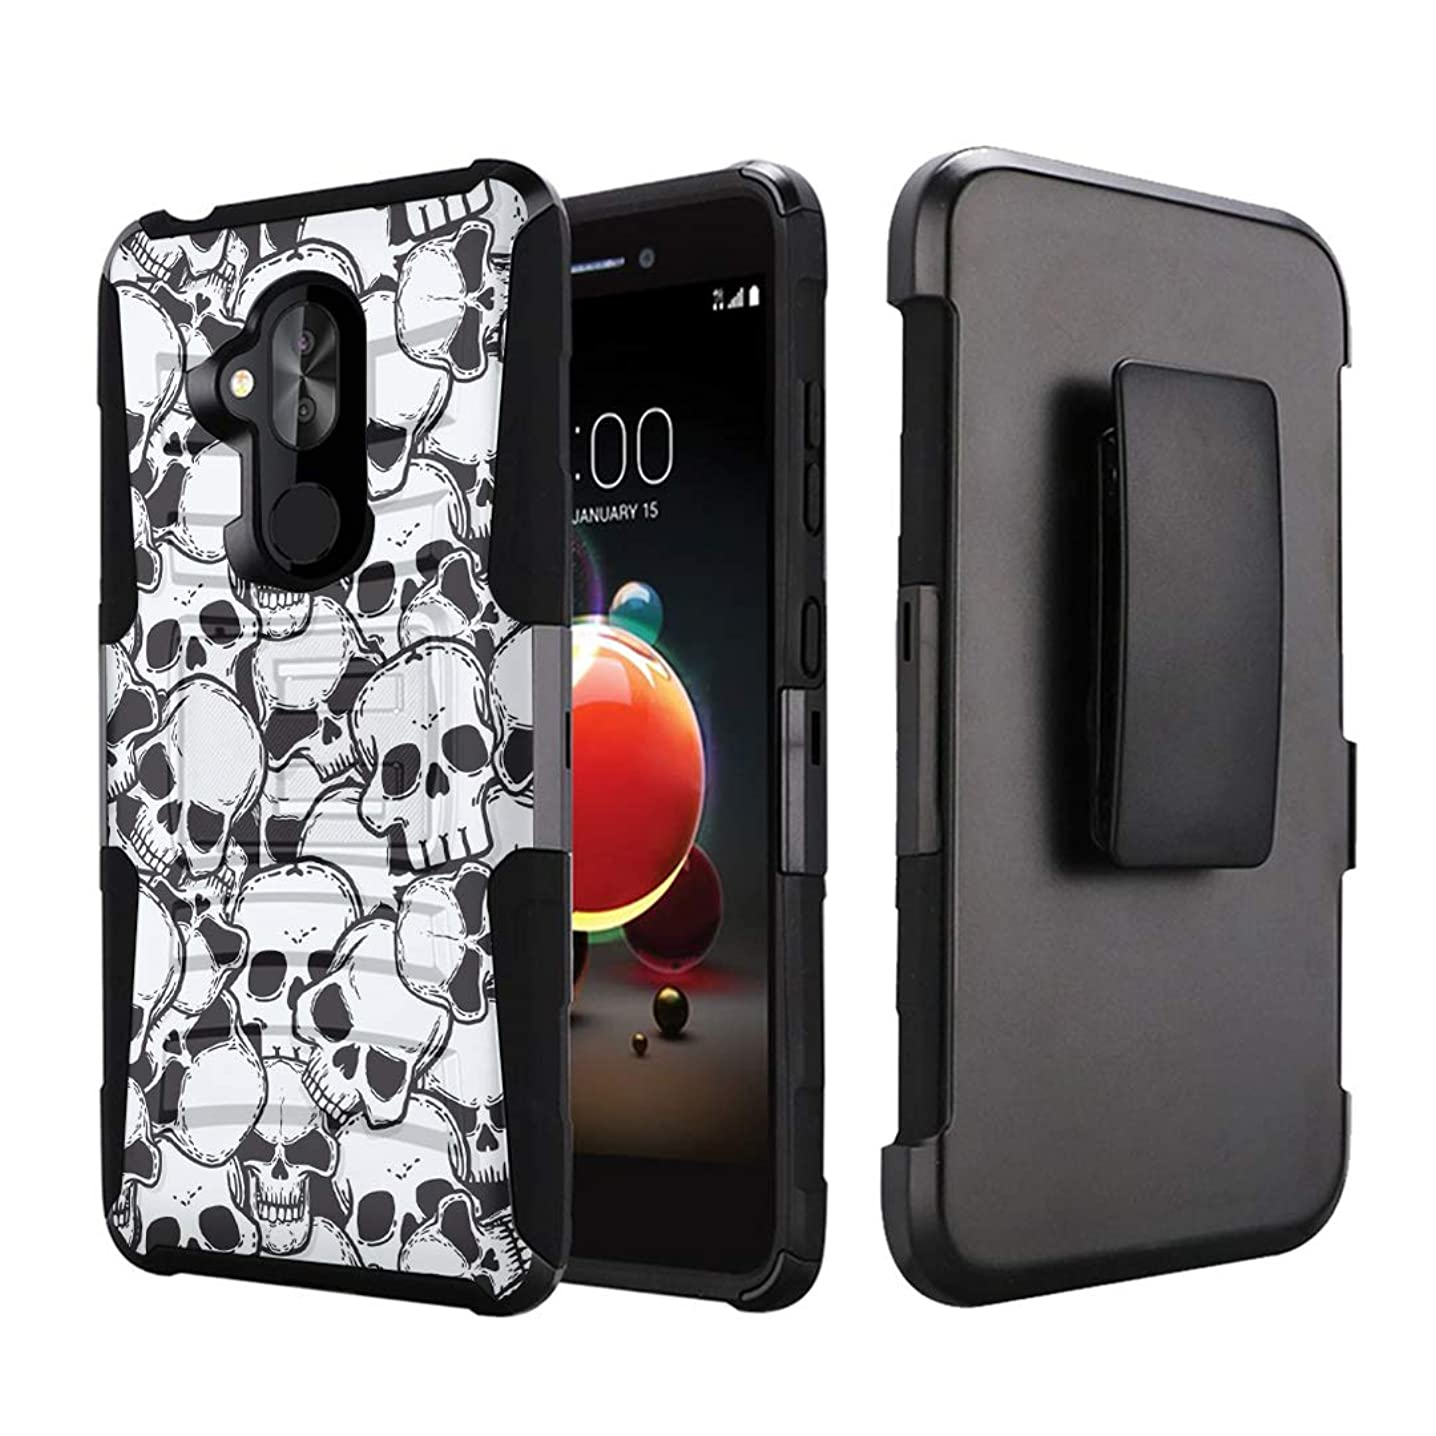 Capsule Case Compatible with T-Mobile Revvl 2 Plus, Alcatel 7 Folio, Alcatel 7 (2018) Metro PCS [Kickstand Holster Combo Heavy Duty Protection Case Black] - (Skull)